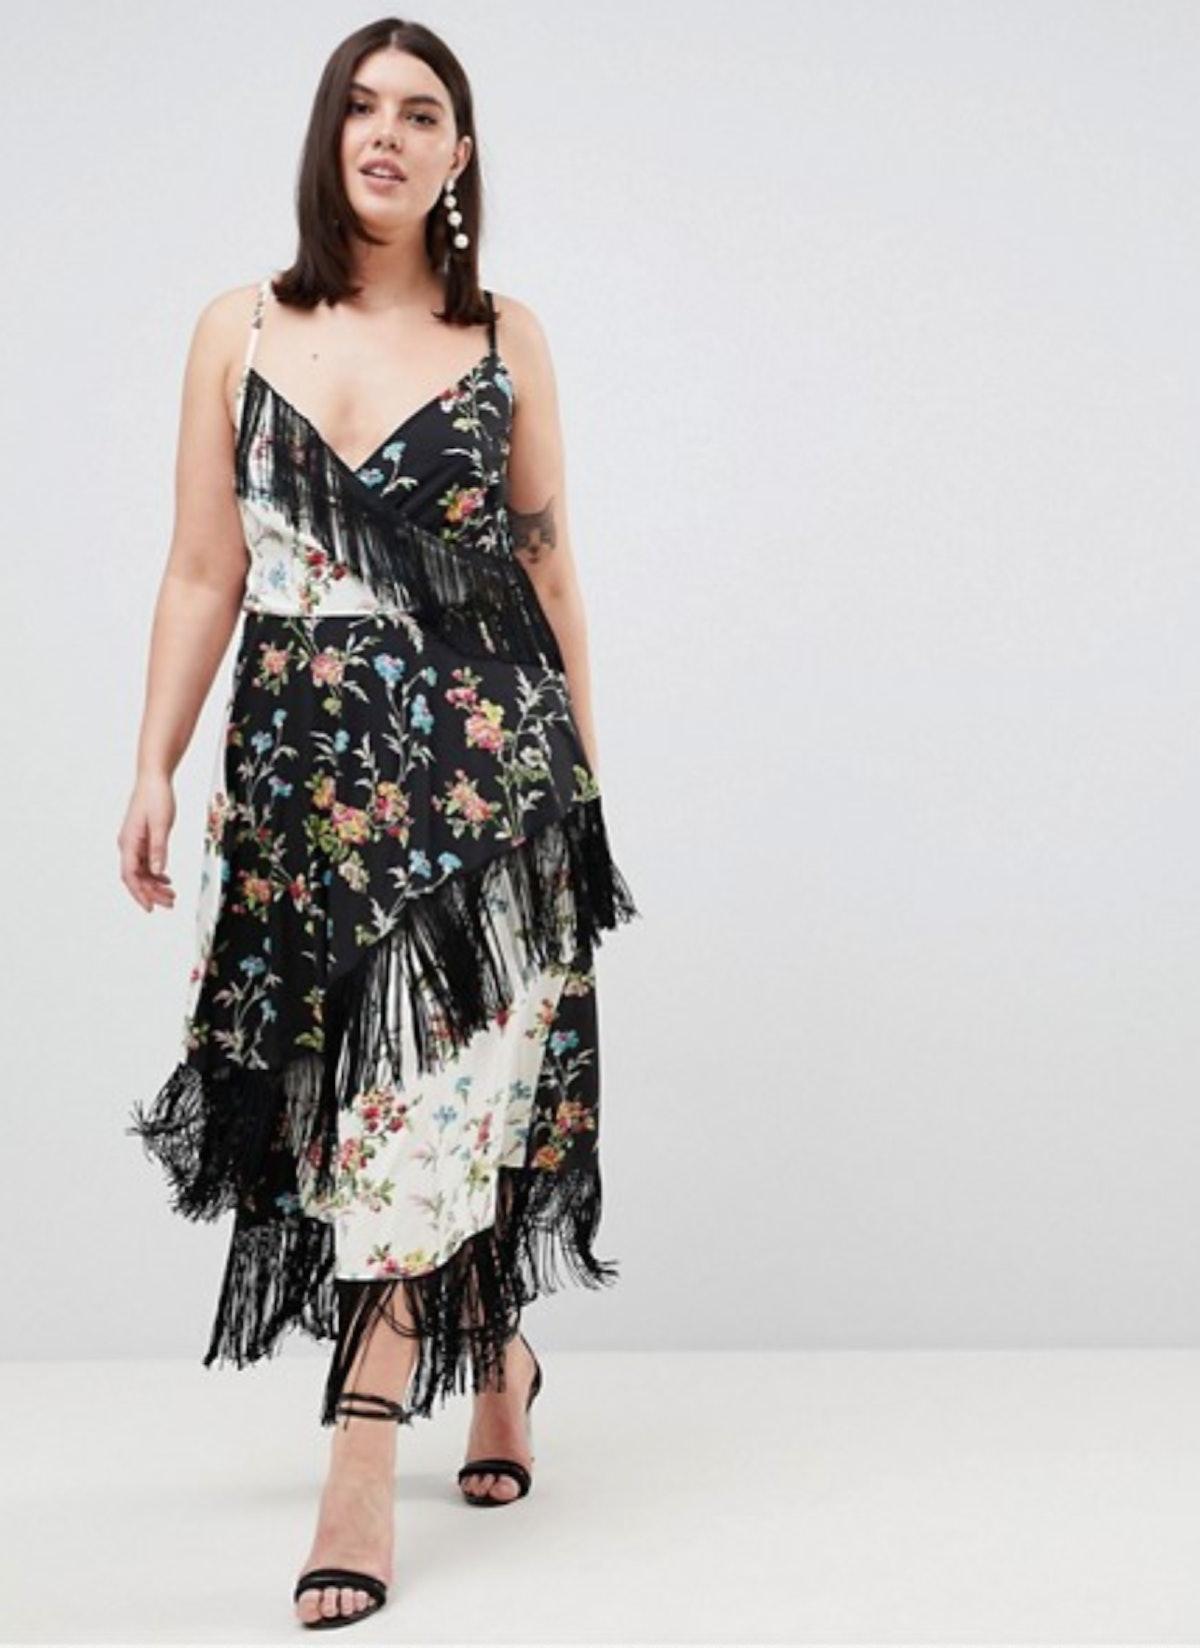 ASOS DESIGN Curve Fringe Cami Midi Dress in Mixed Floral Print